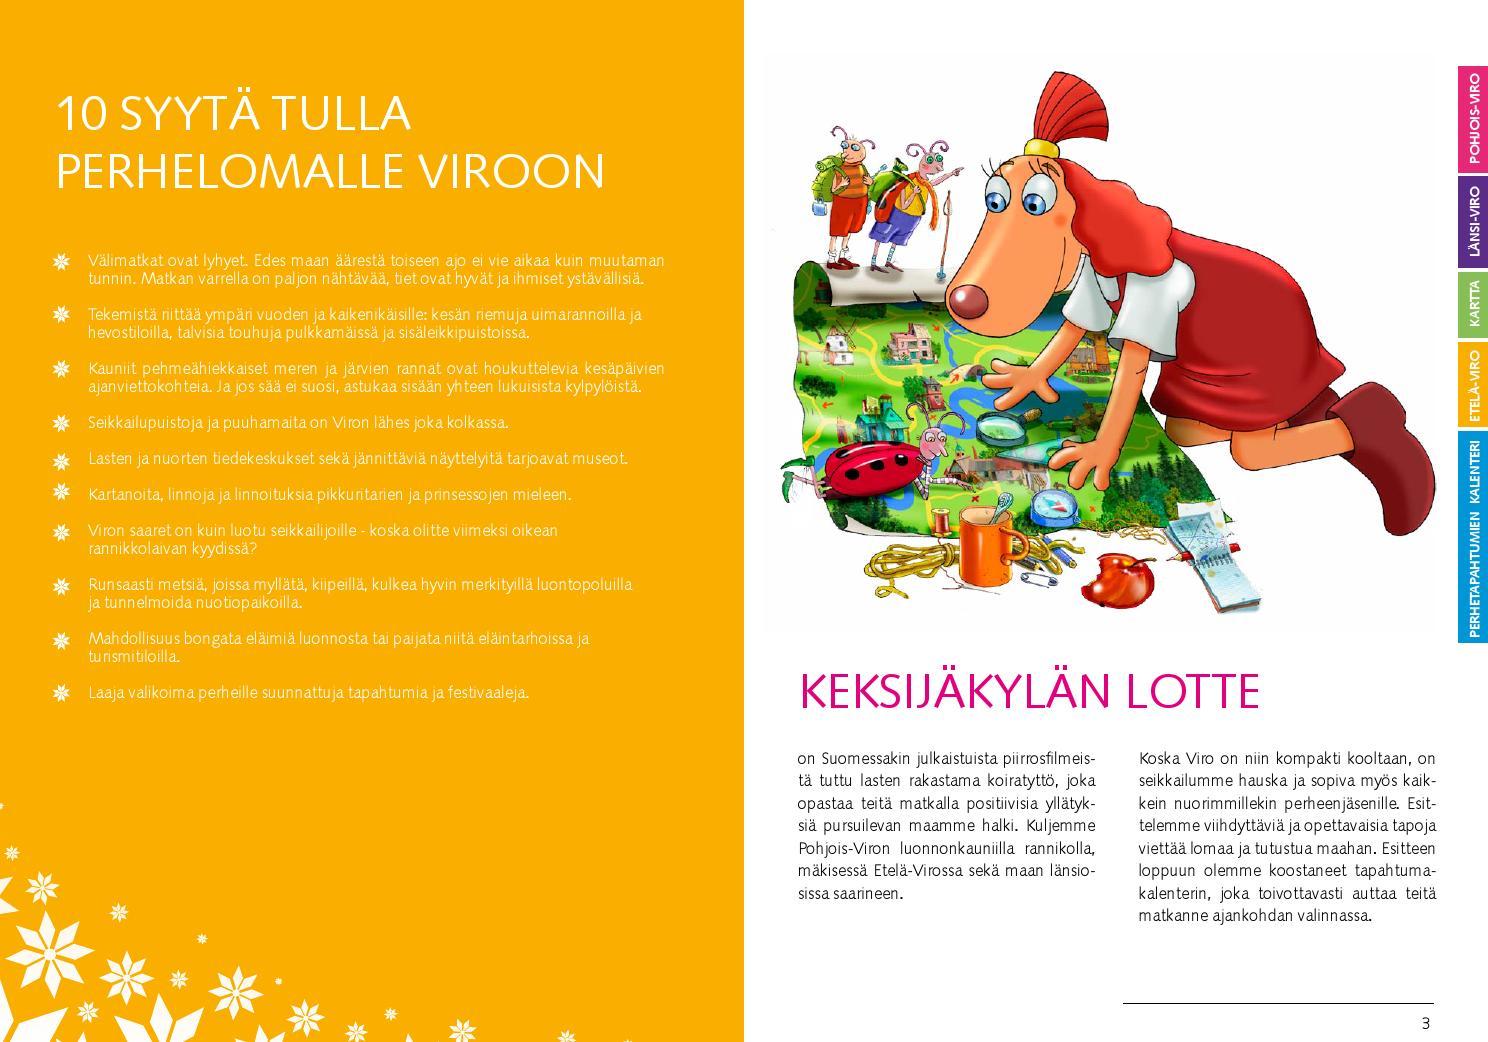 Perheloma Virossa Naurunappulat Kaakkoon By Visit Estonia Issuu